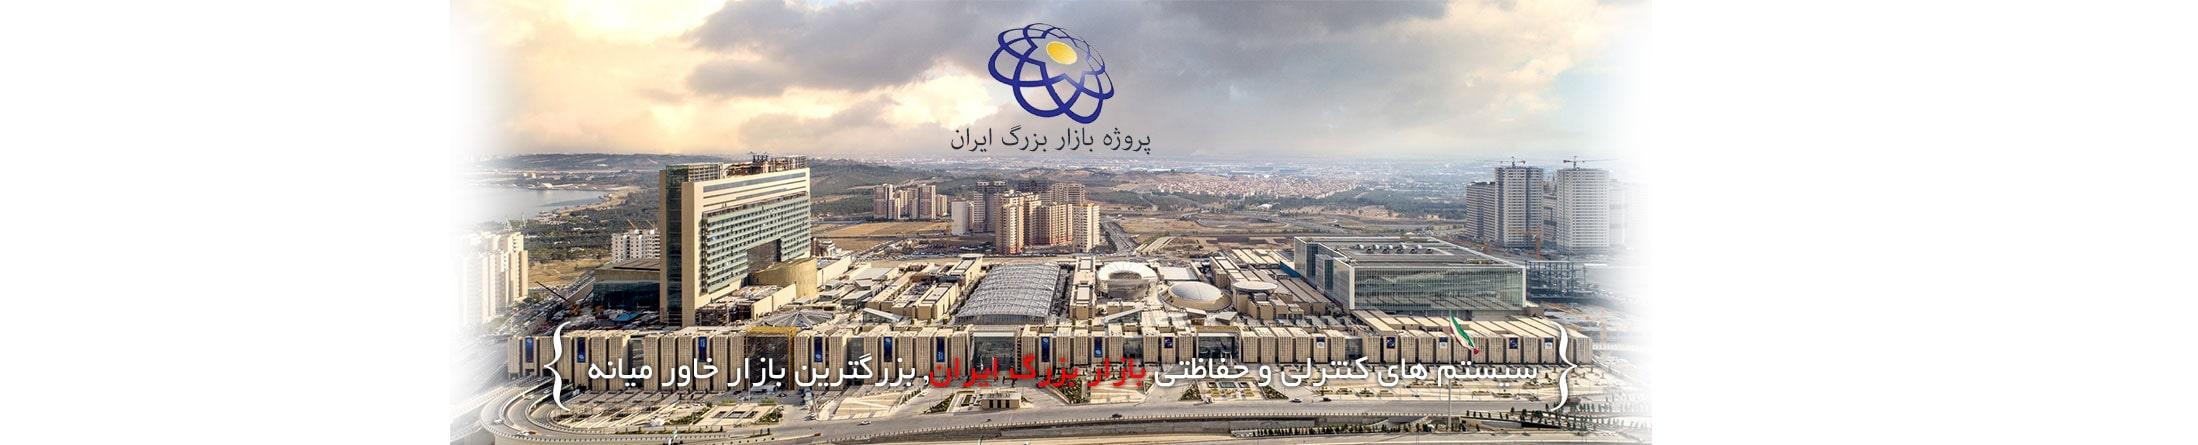 iran mall cctv